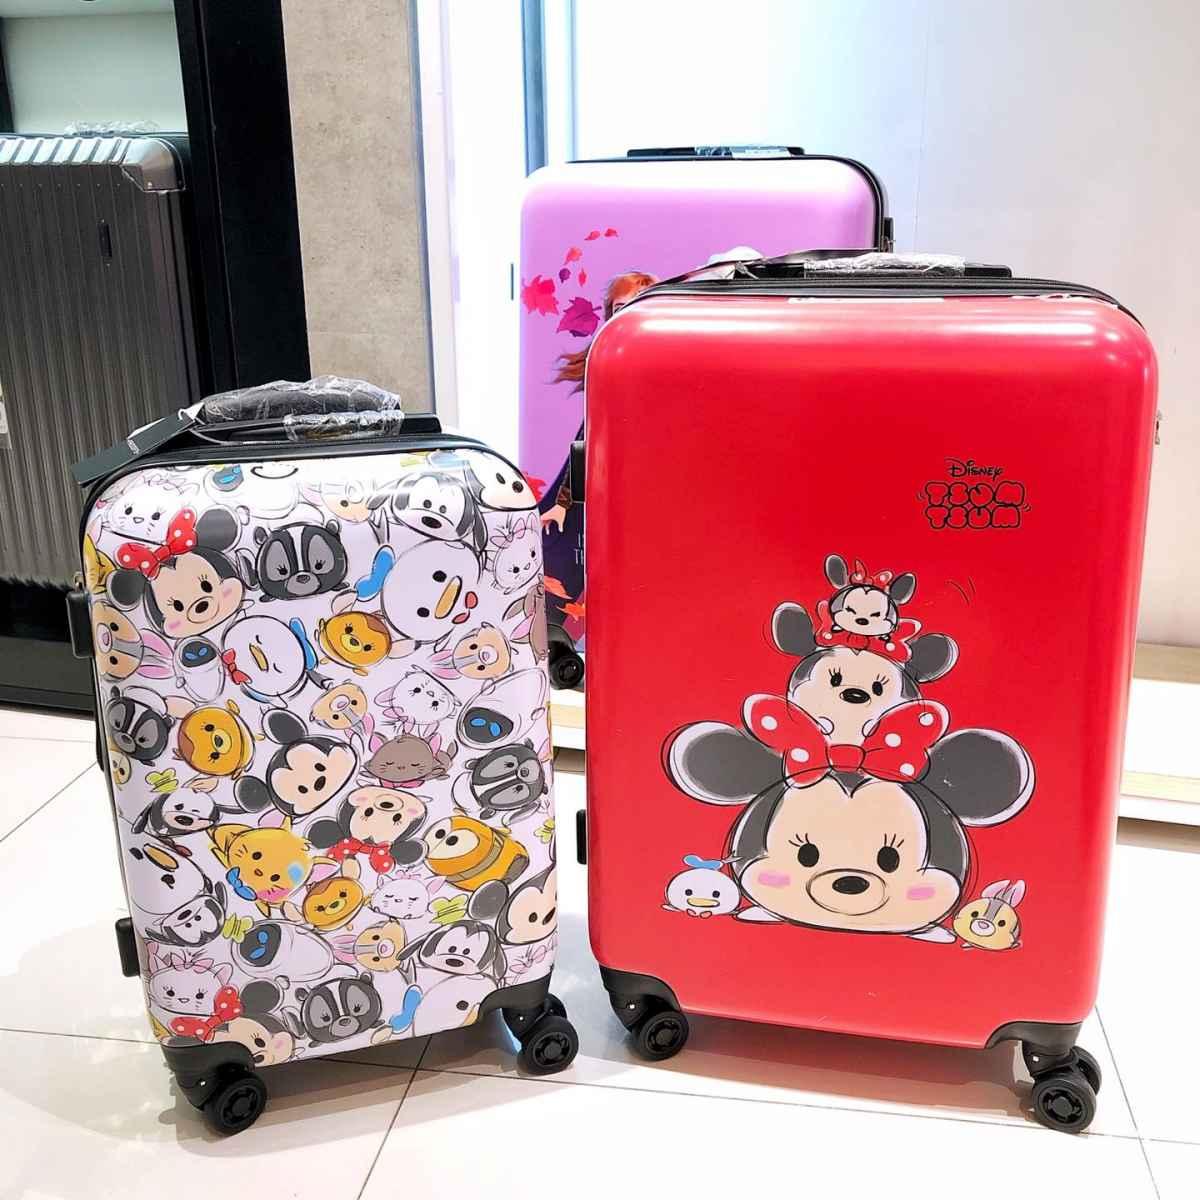 Proofs กระเป๋าเดินทาง รุ่น Disney Tsum Tsum